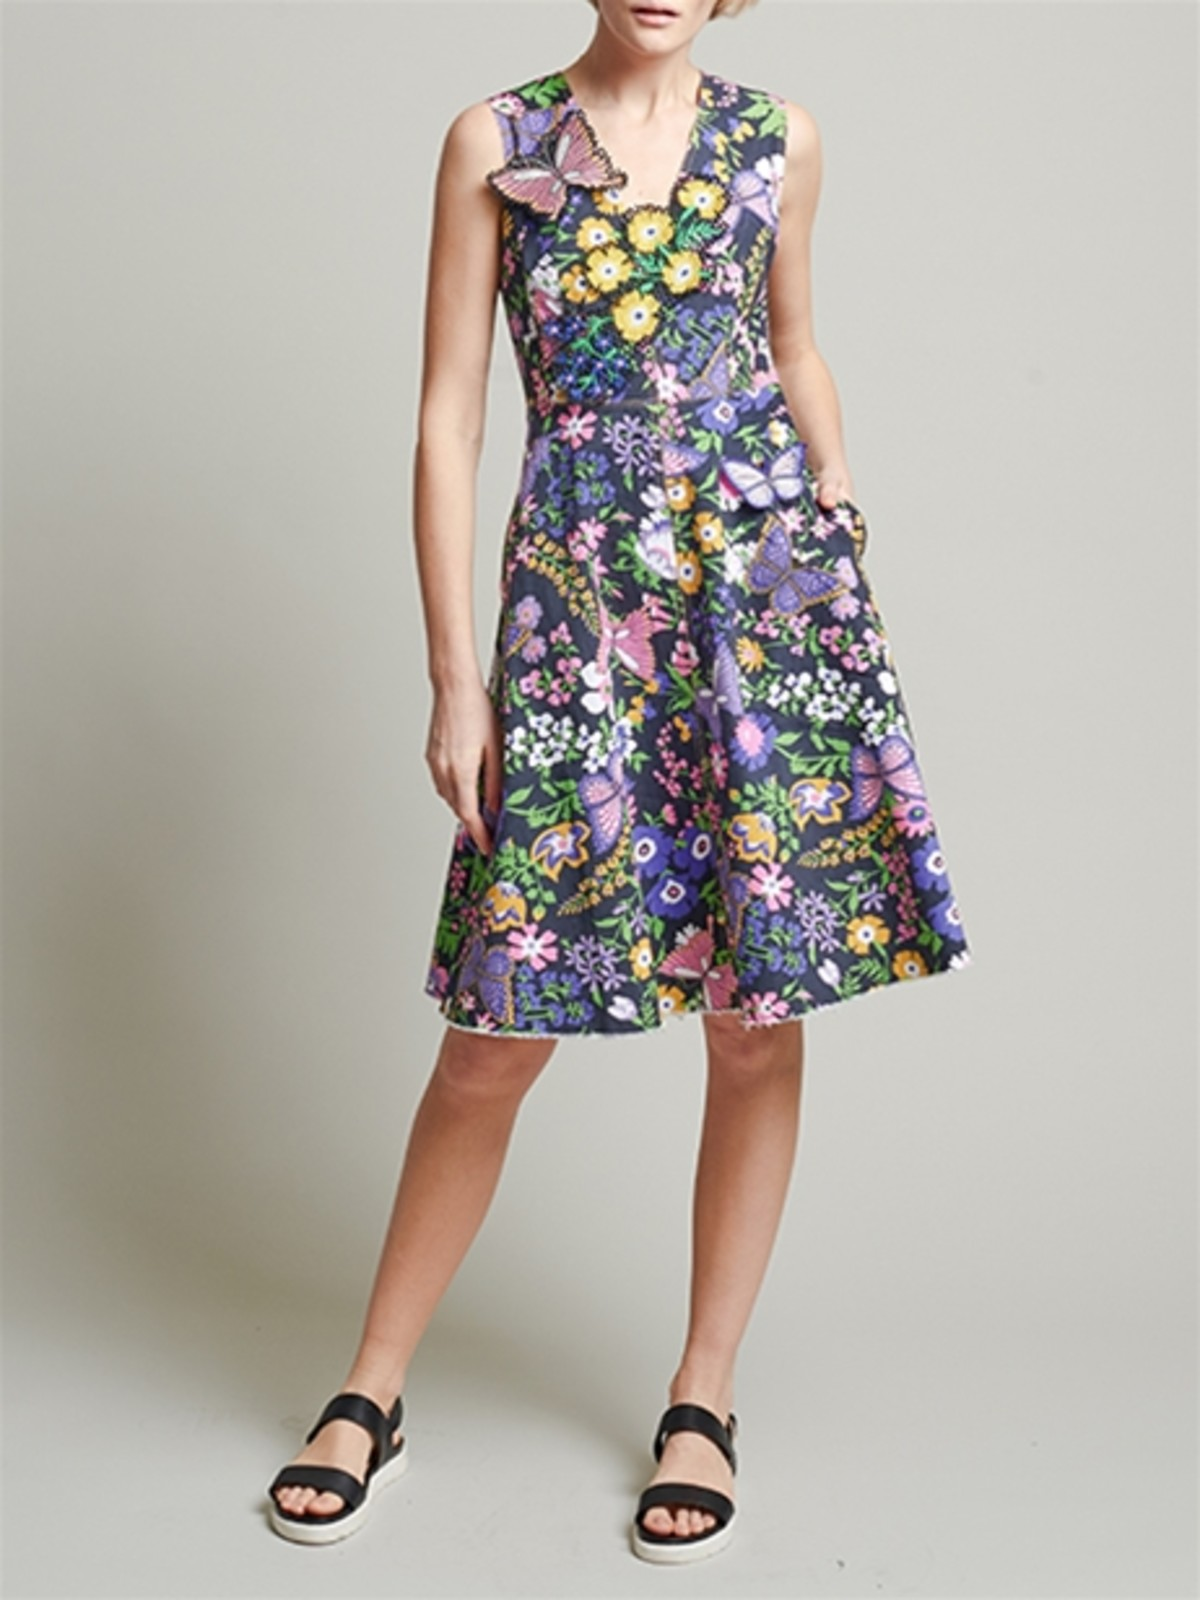 Vivienne Tam butterfly garden dress